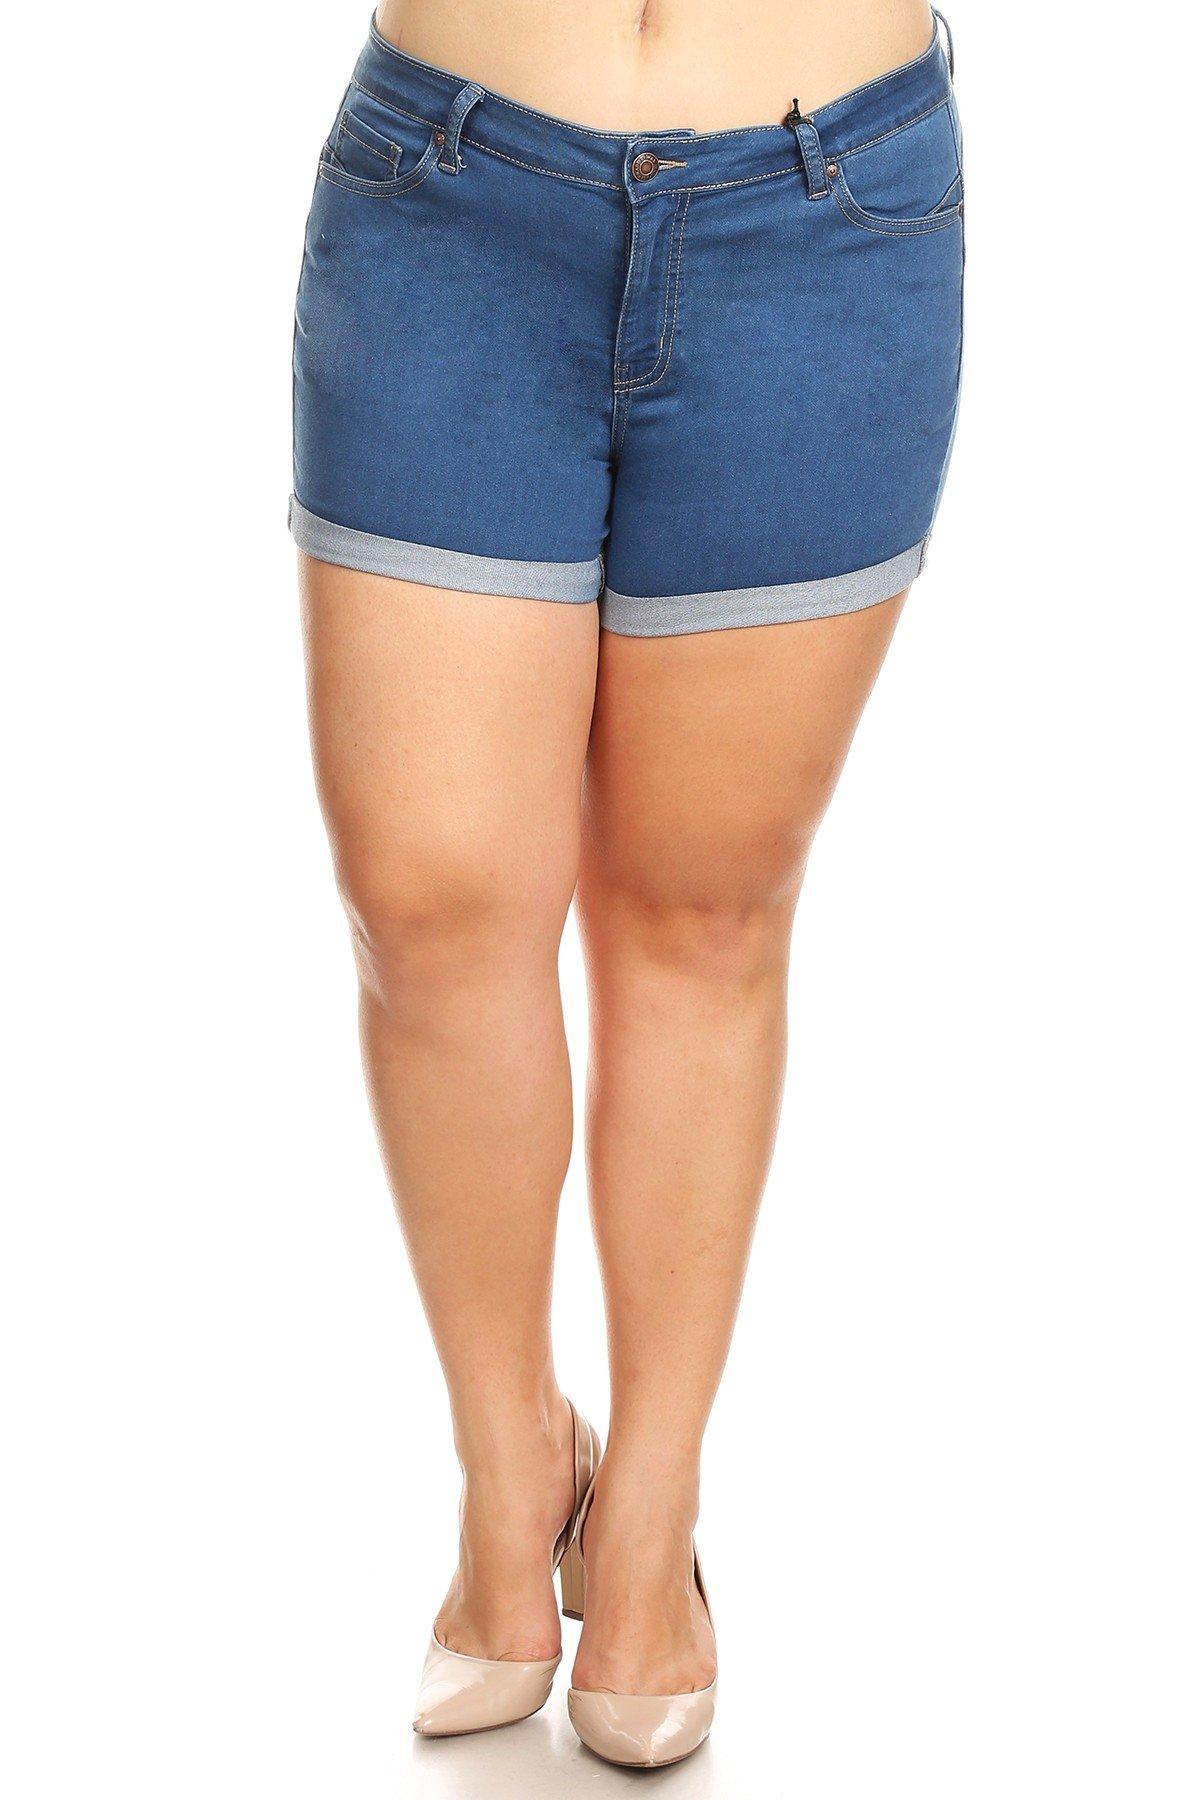 Women's Plus Size High Waist Fitted Denim Jean Shorts (2XL, Medium) by Wax Jean